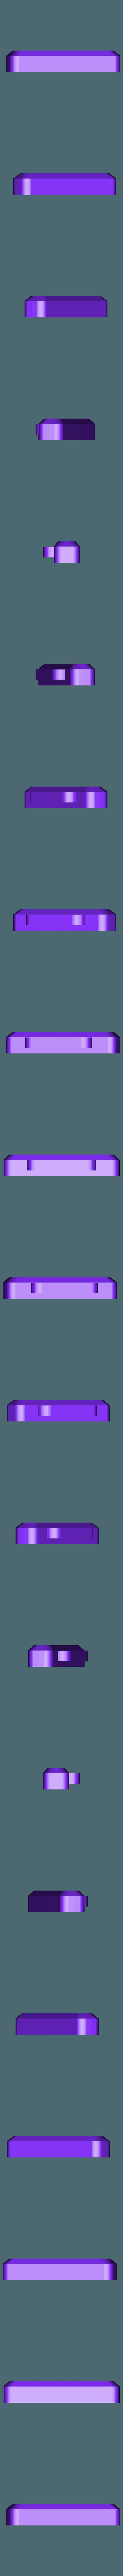 foglight_zt.stl Download free STL file Roof & Fog light LED kit for Radio Control models • 3D printer object, 3dxl